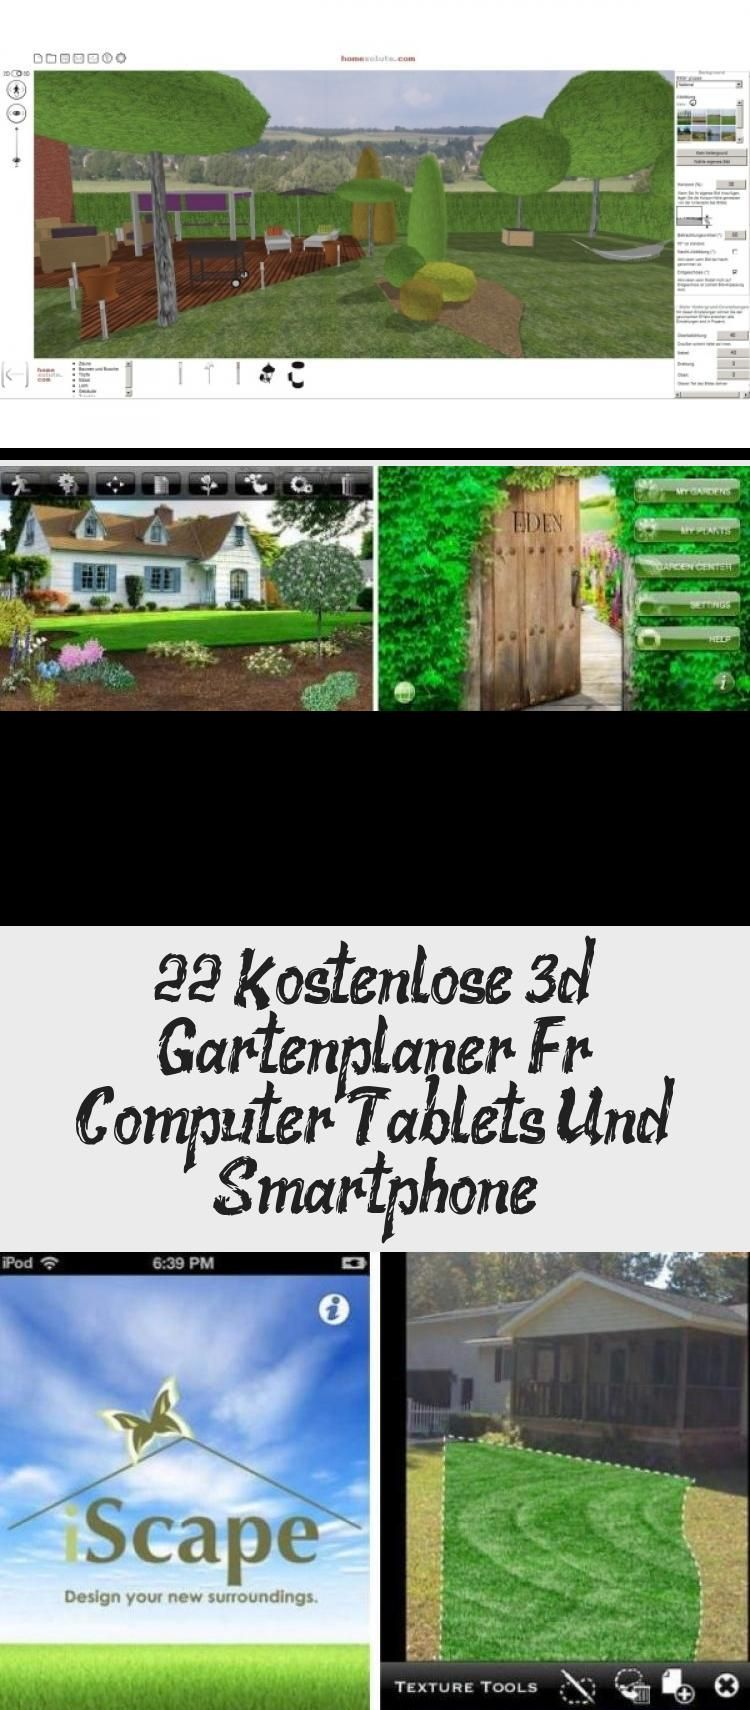 Planer Landschaftsbau Online Software Mein Schoener Garten Planungstool Gartenplanunghang Gartenplanungkinder Gartenplanungid In 2020 Texture Tools Smartphone Scape